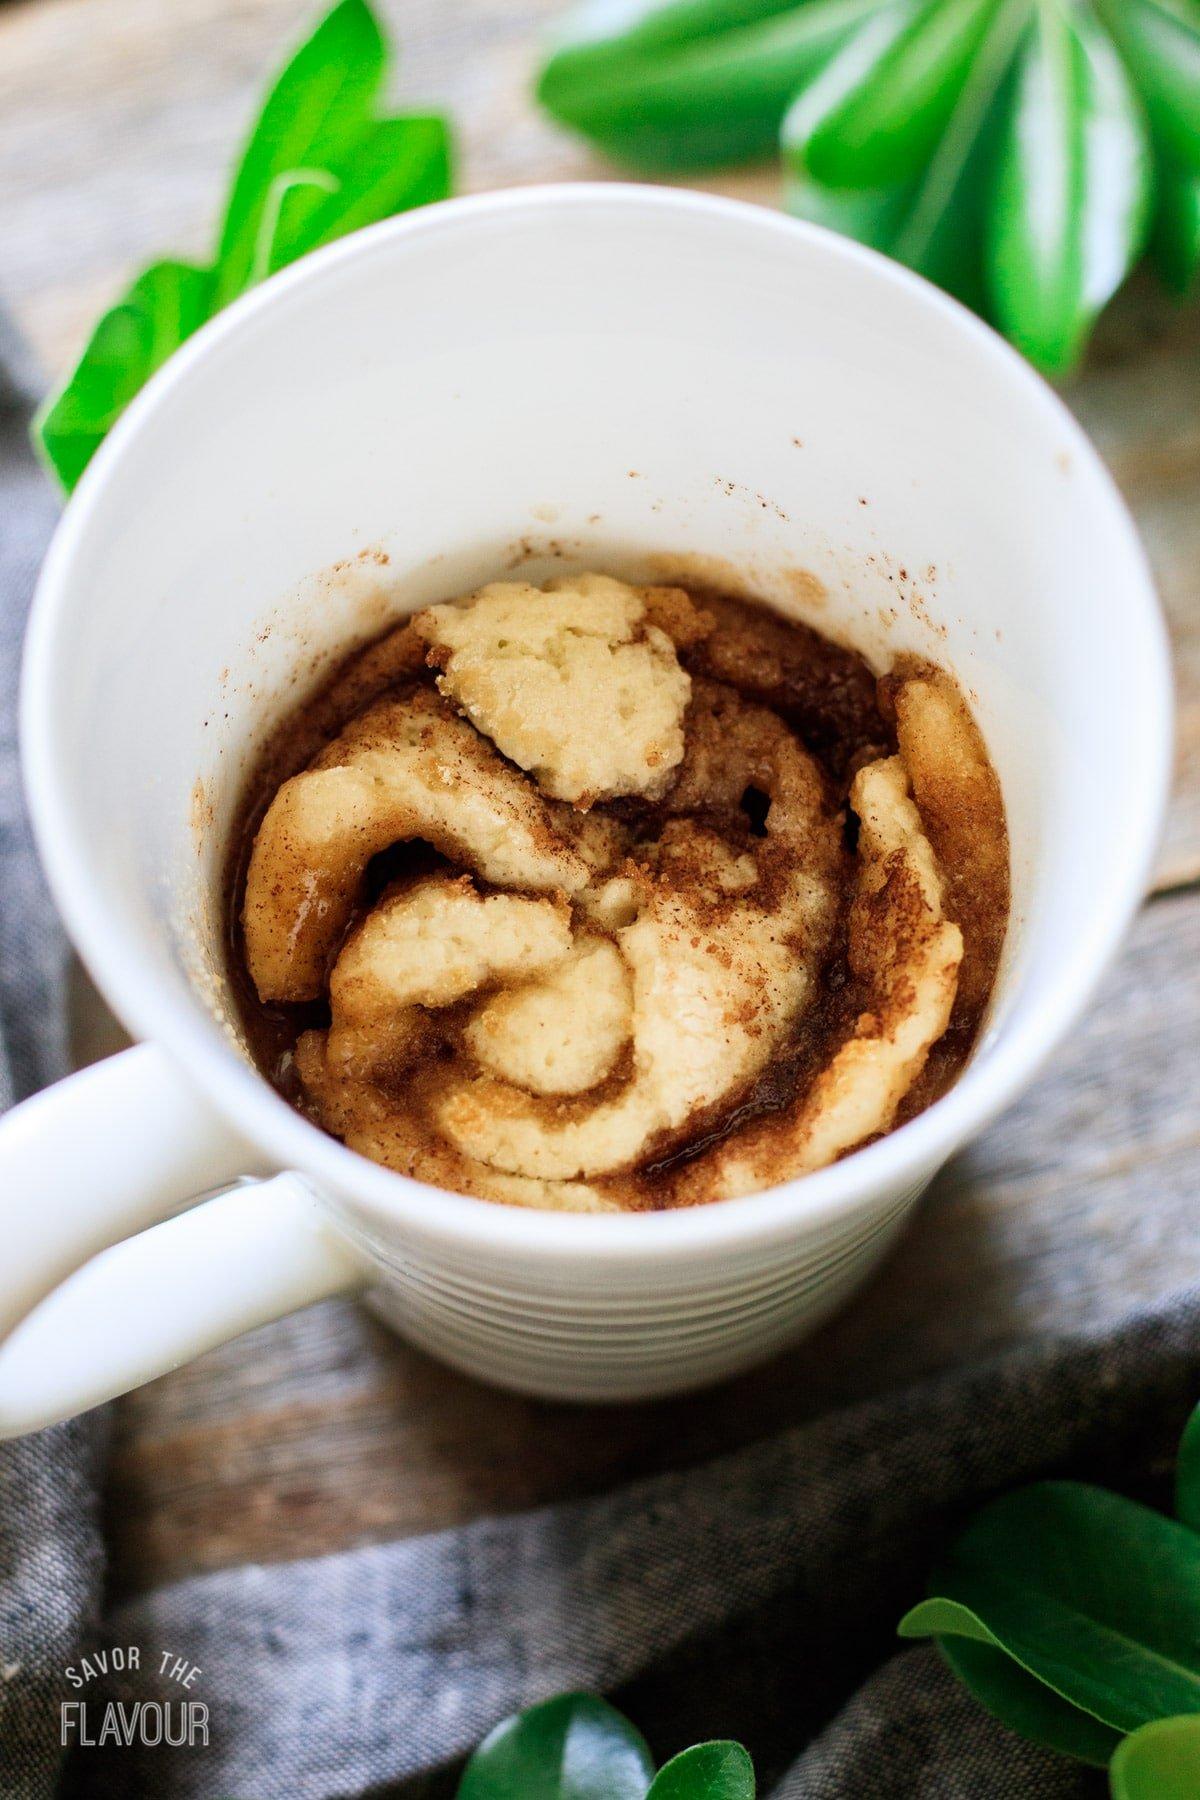 baked cinnamon roll in a mug